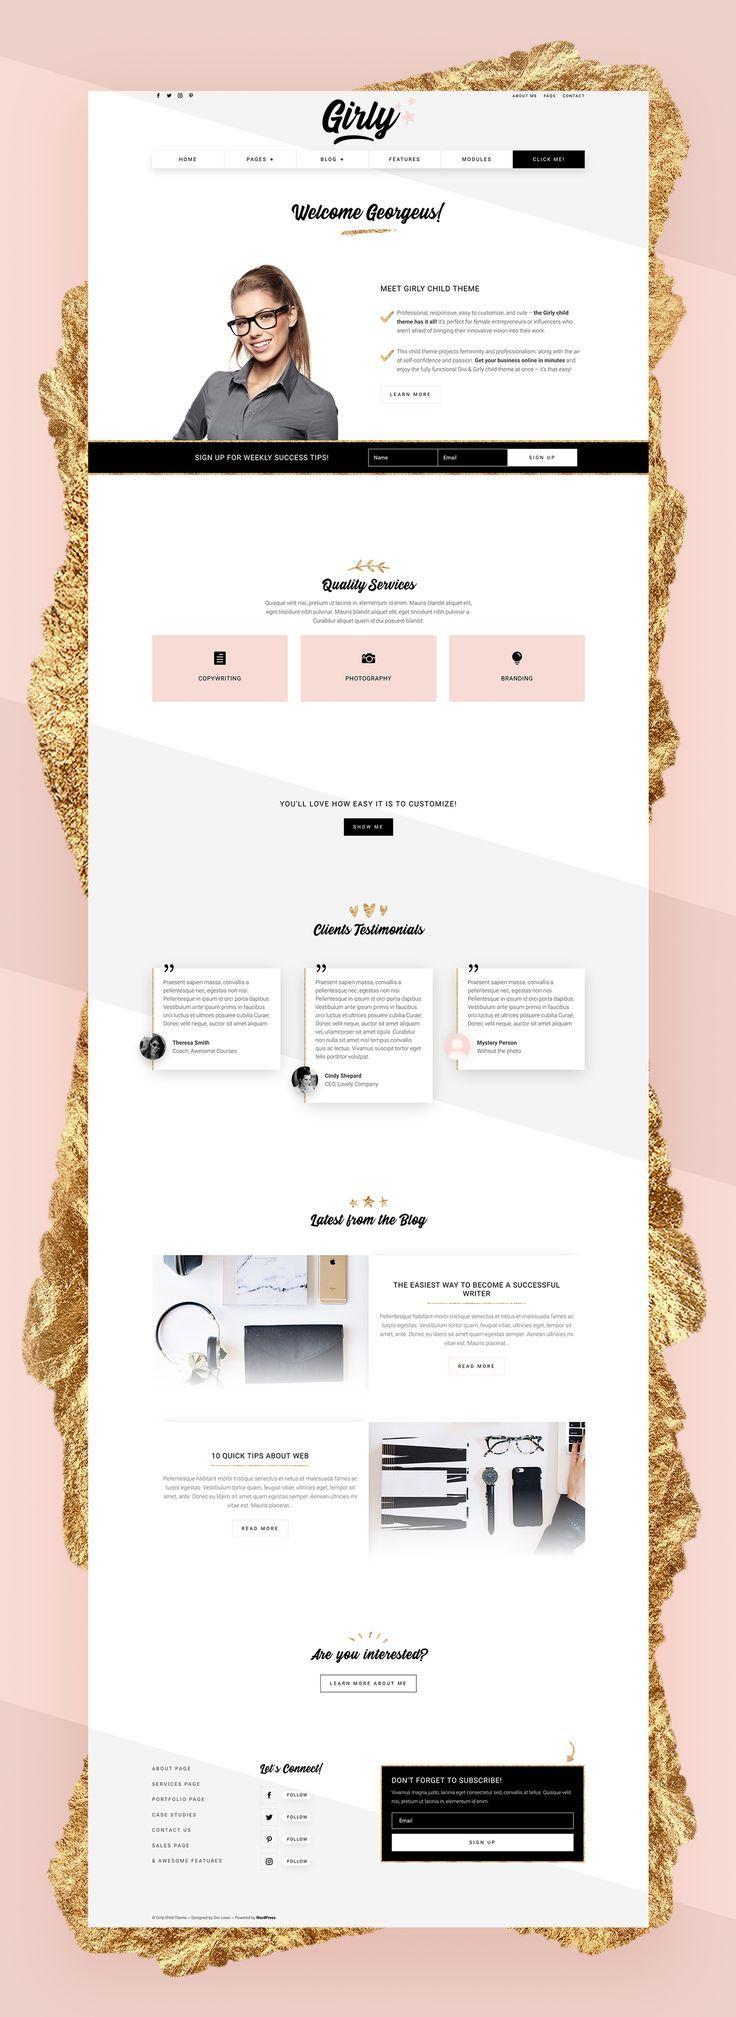 Girly B3 Multimedia Solutions Web Design Tips Web Design Website Design Inspiration